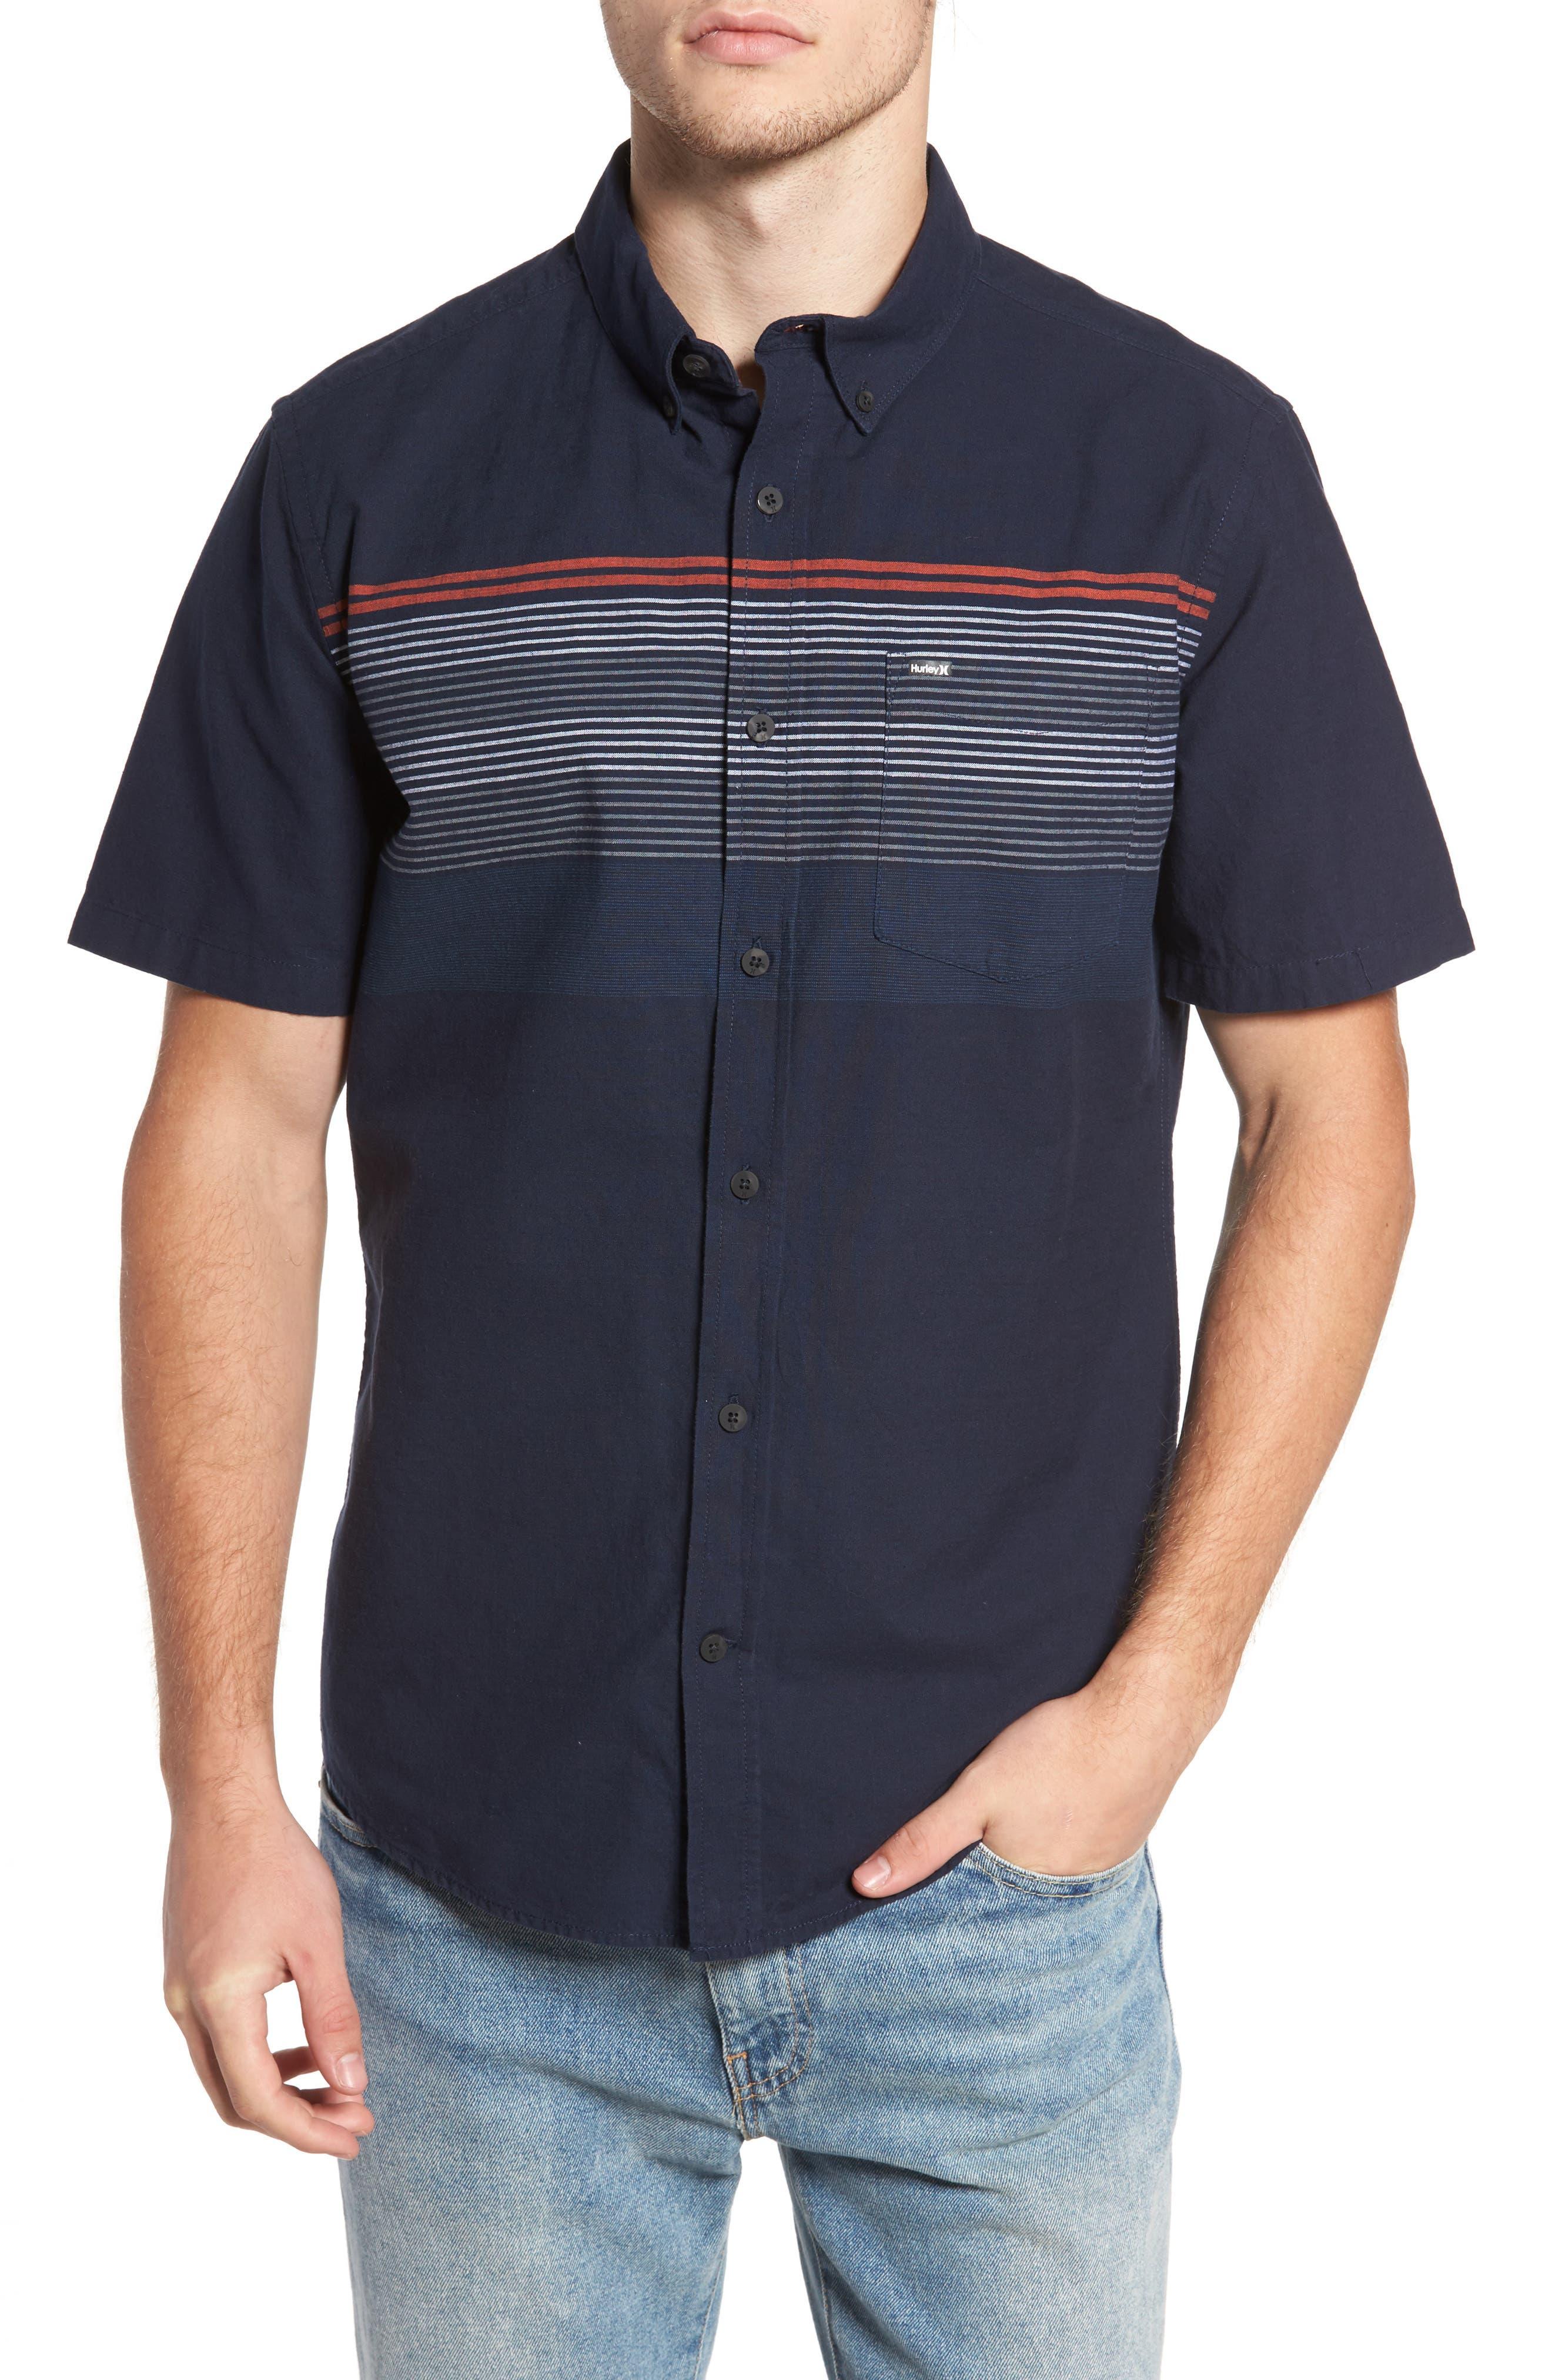 Hurley Paradise Coves Woven Shirt